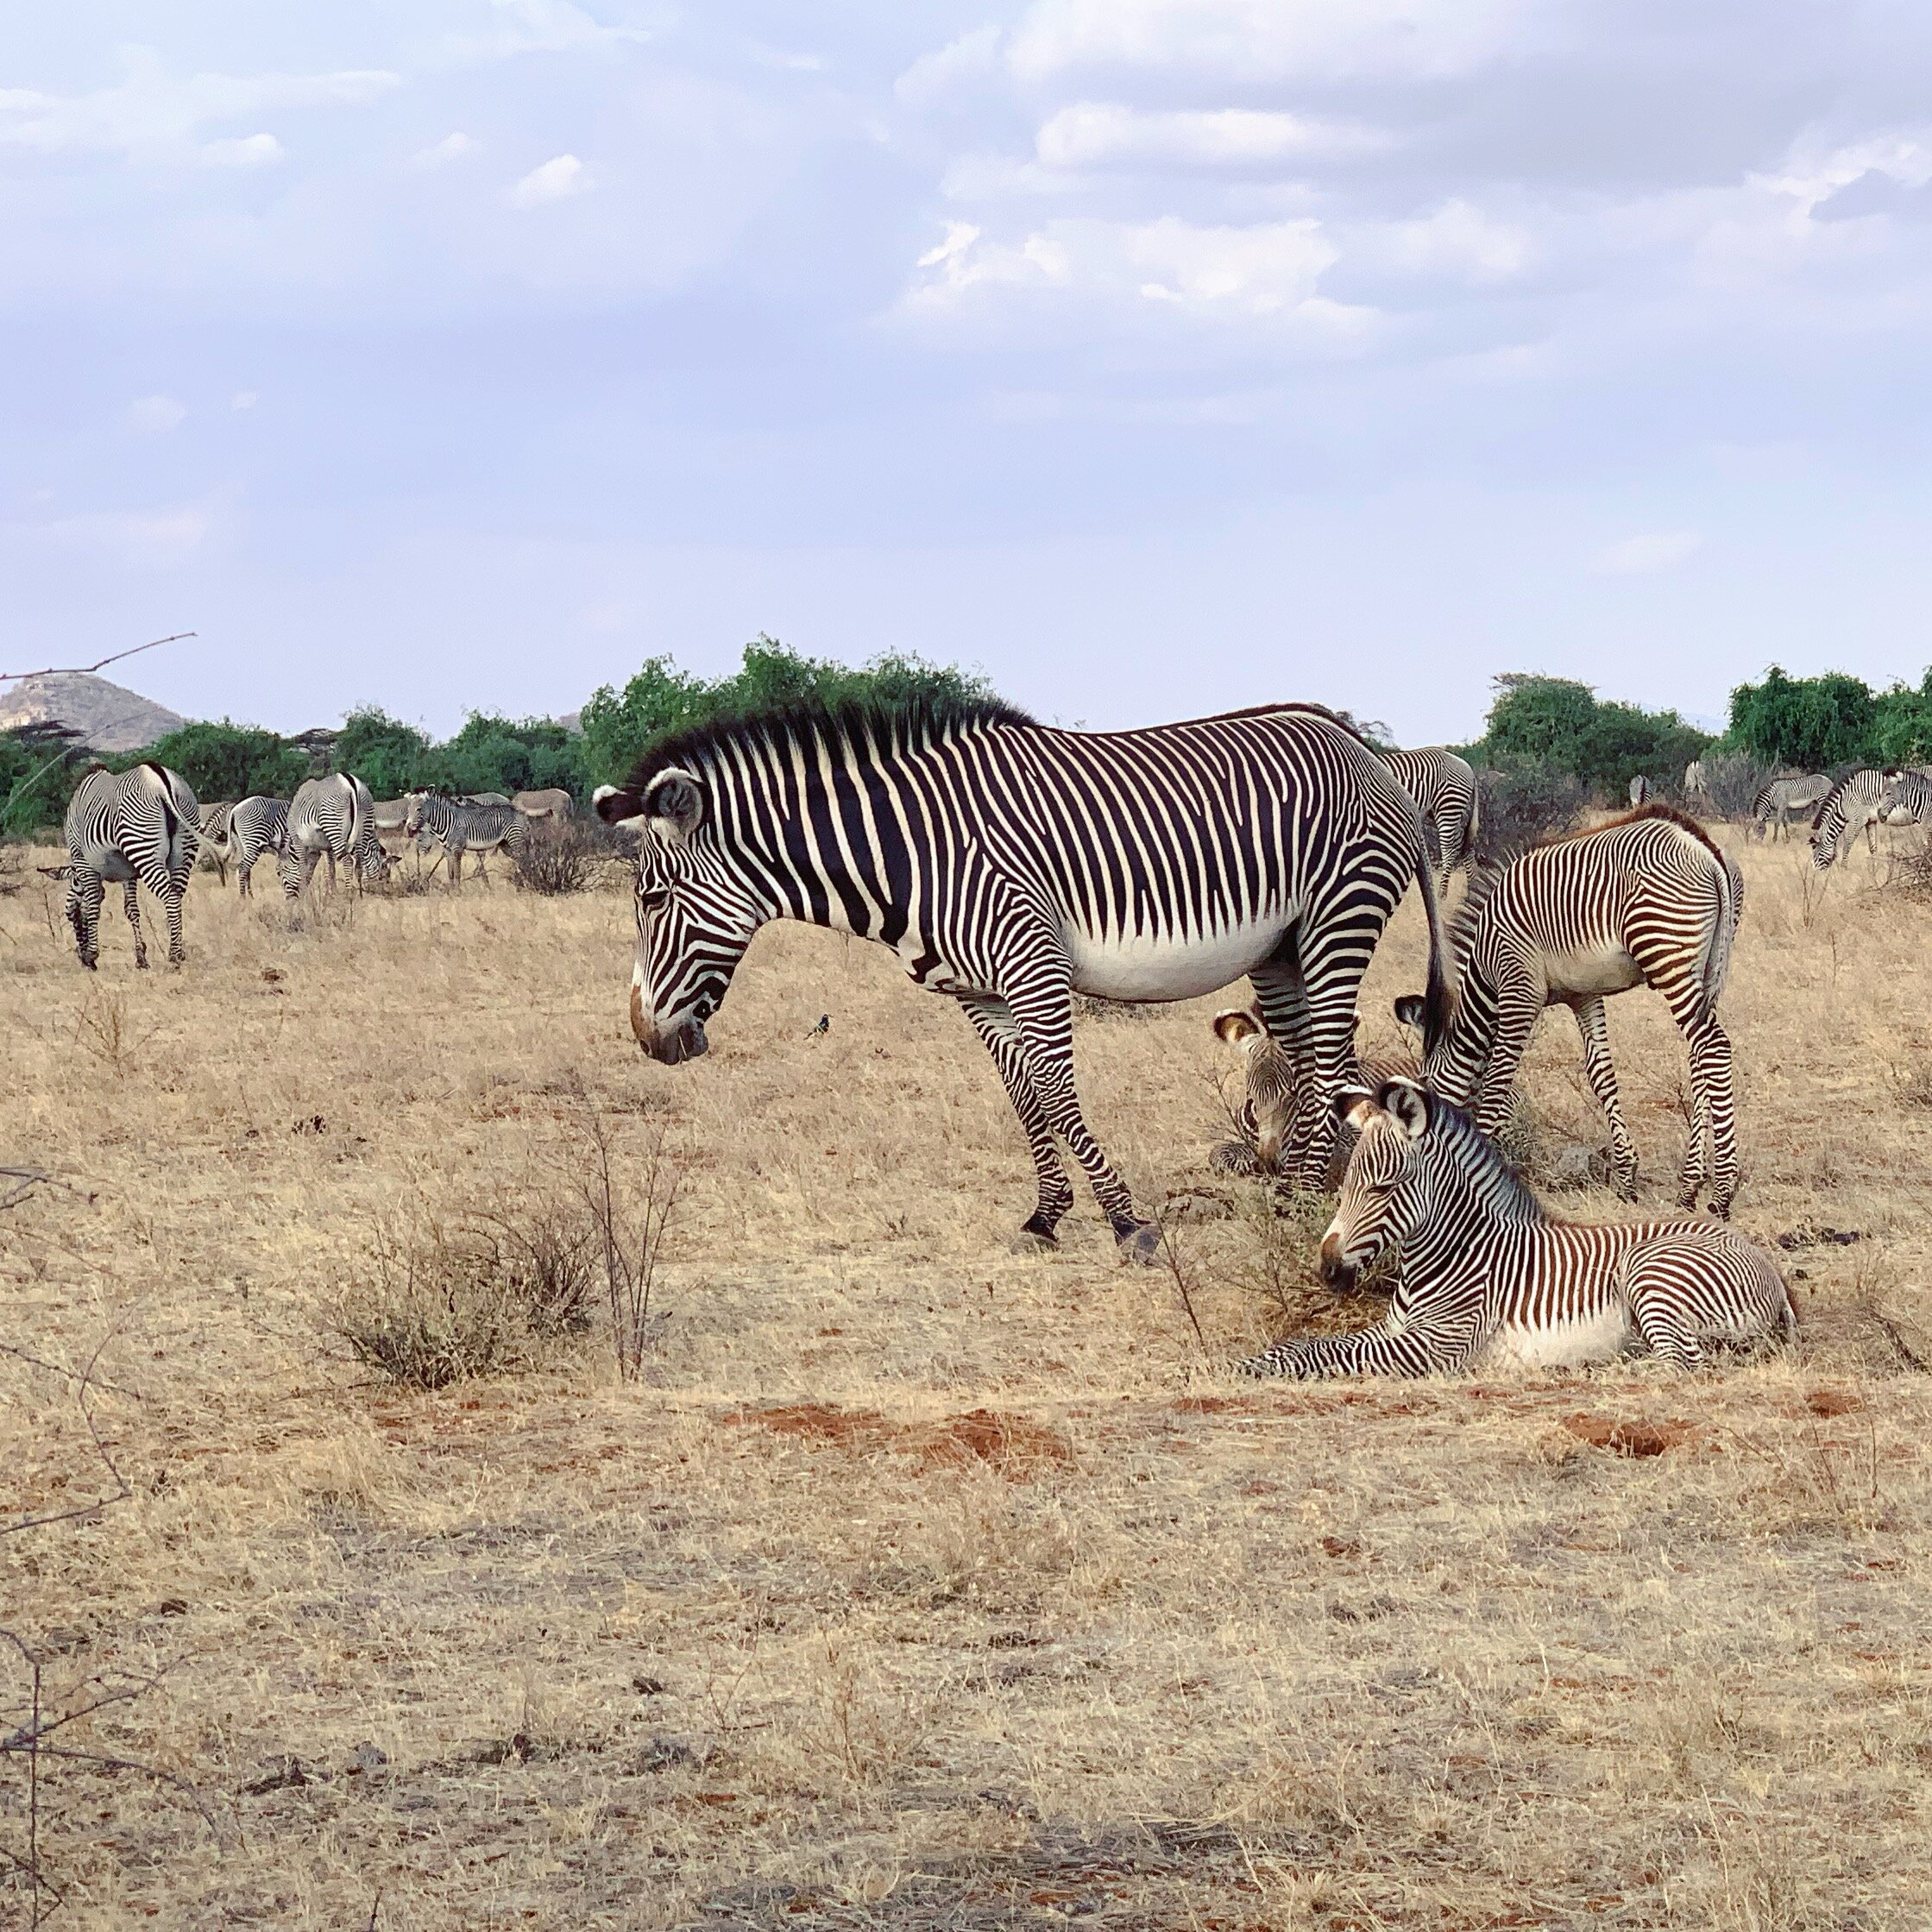 Family of Grevy's Zebras